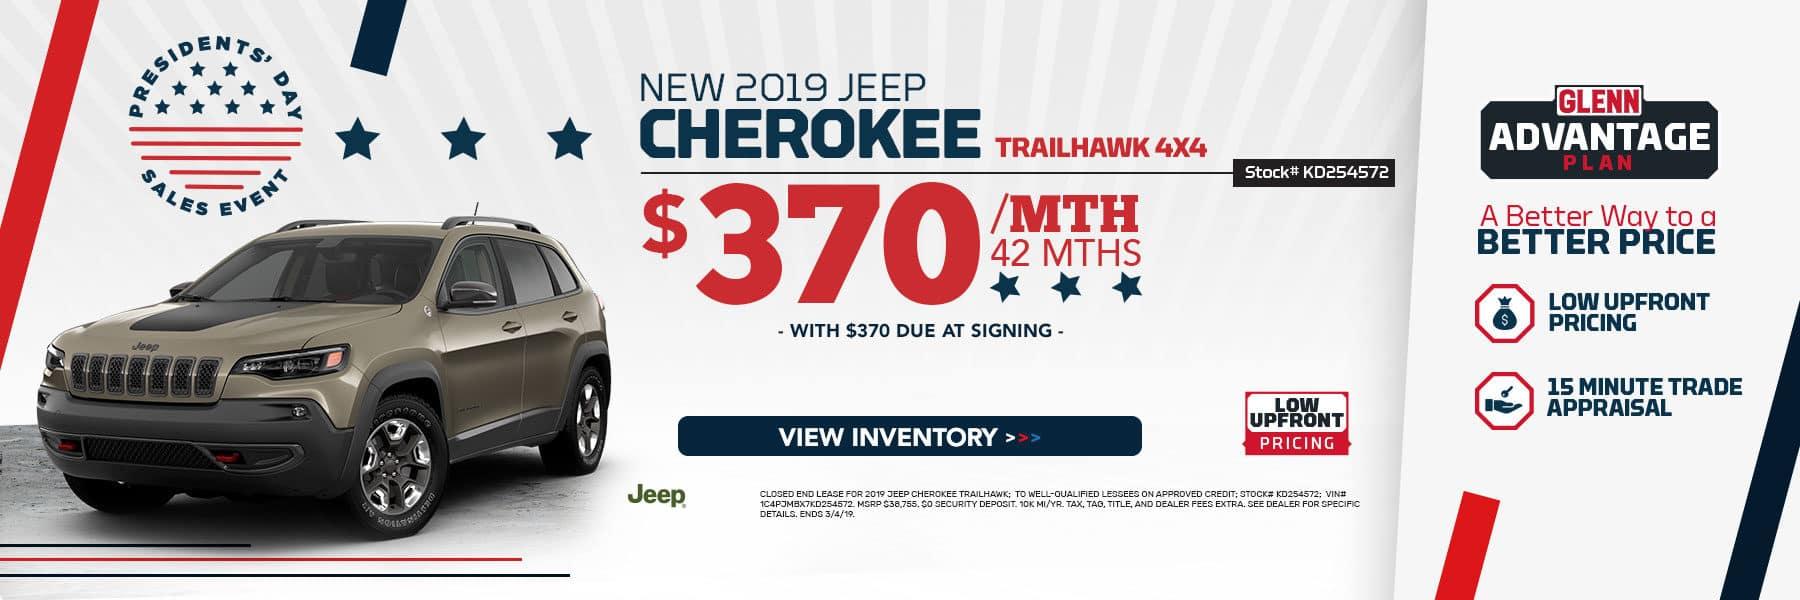 New 2019 Jeep Cherokee!